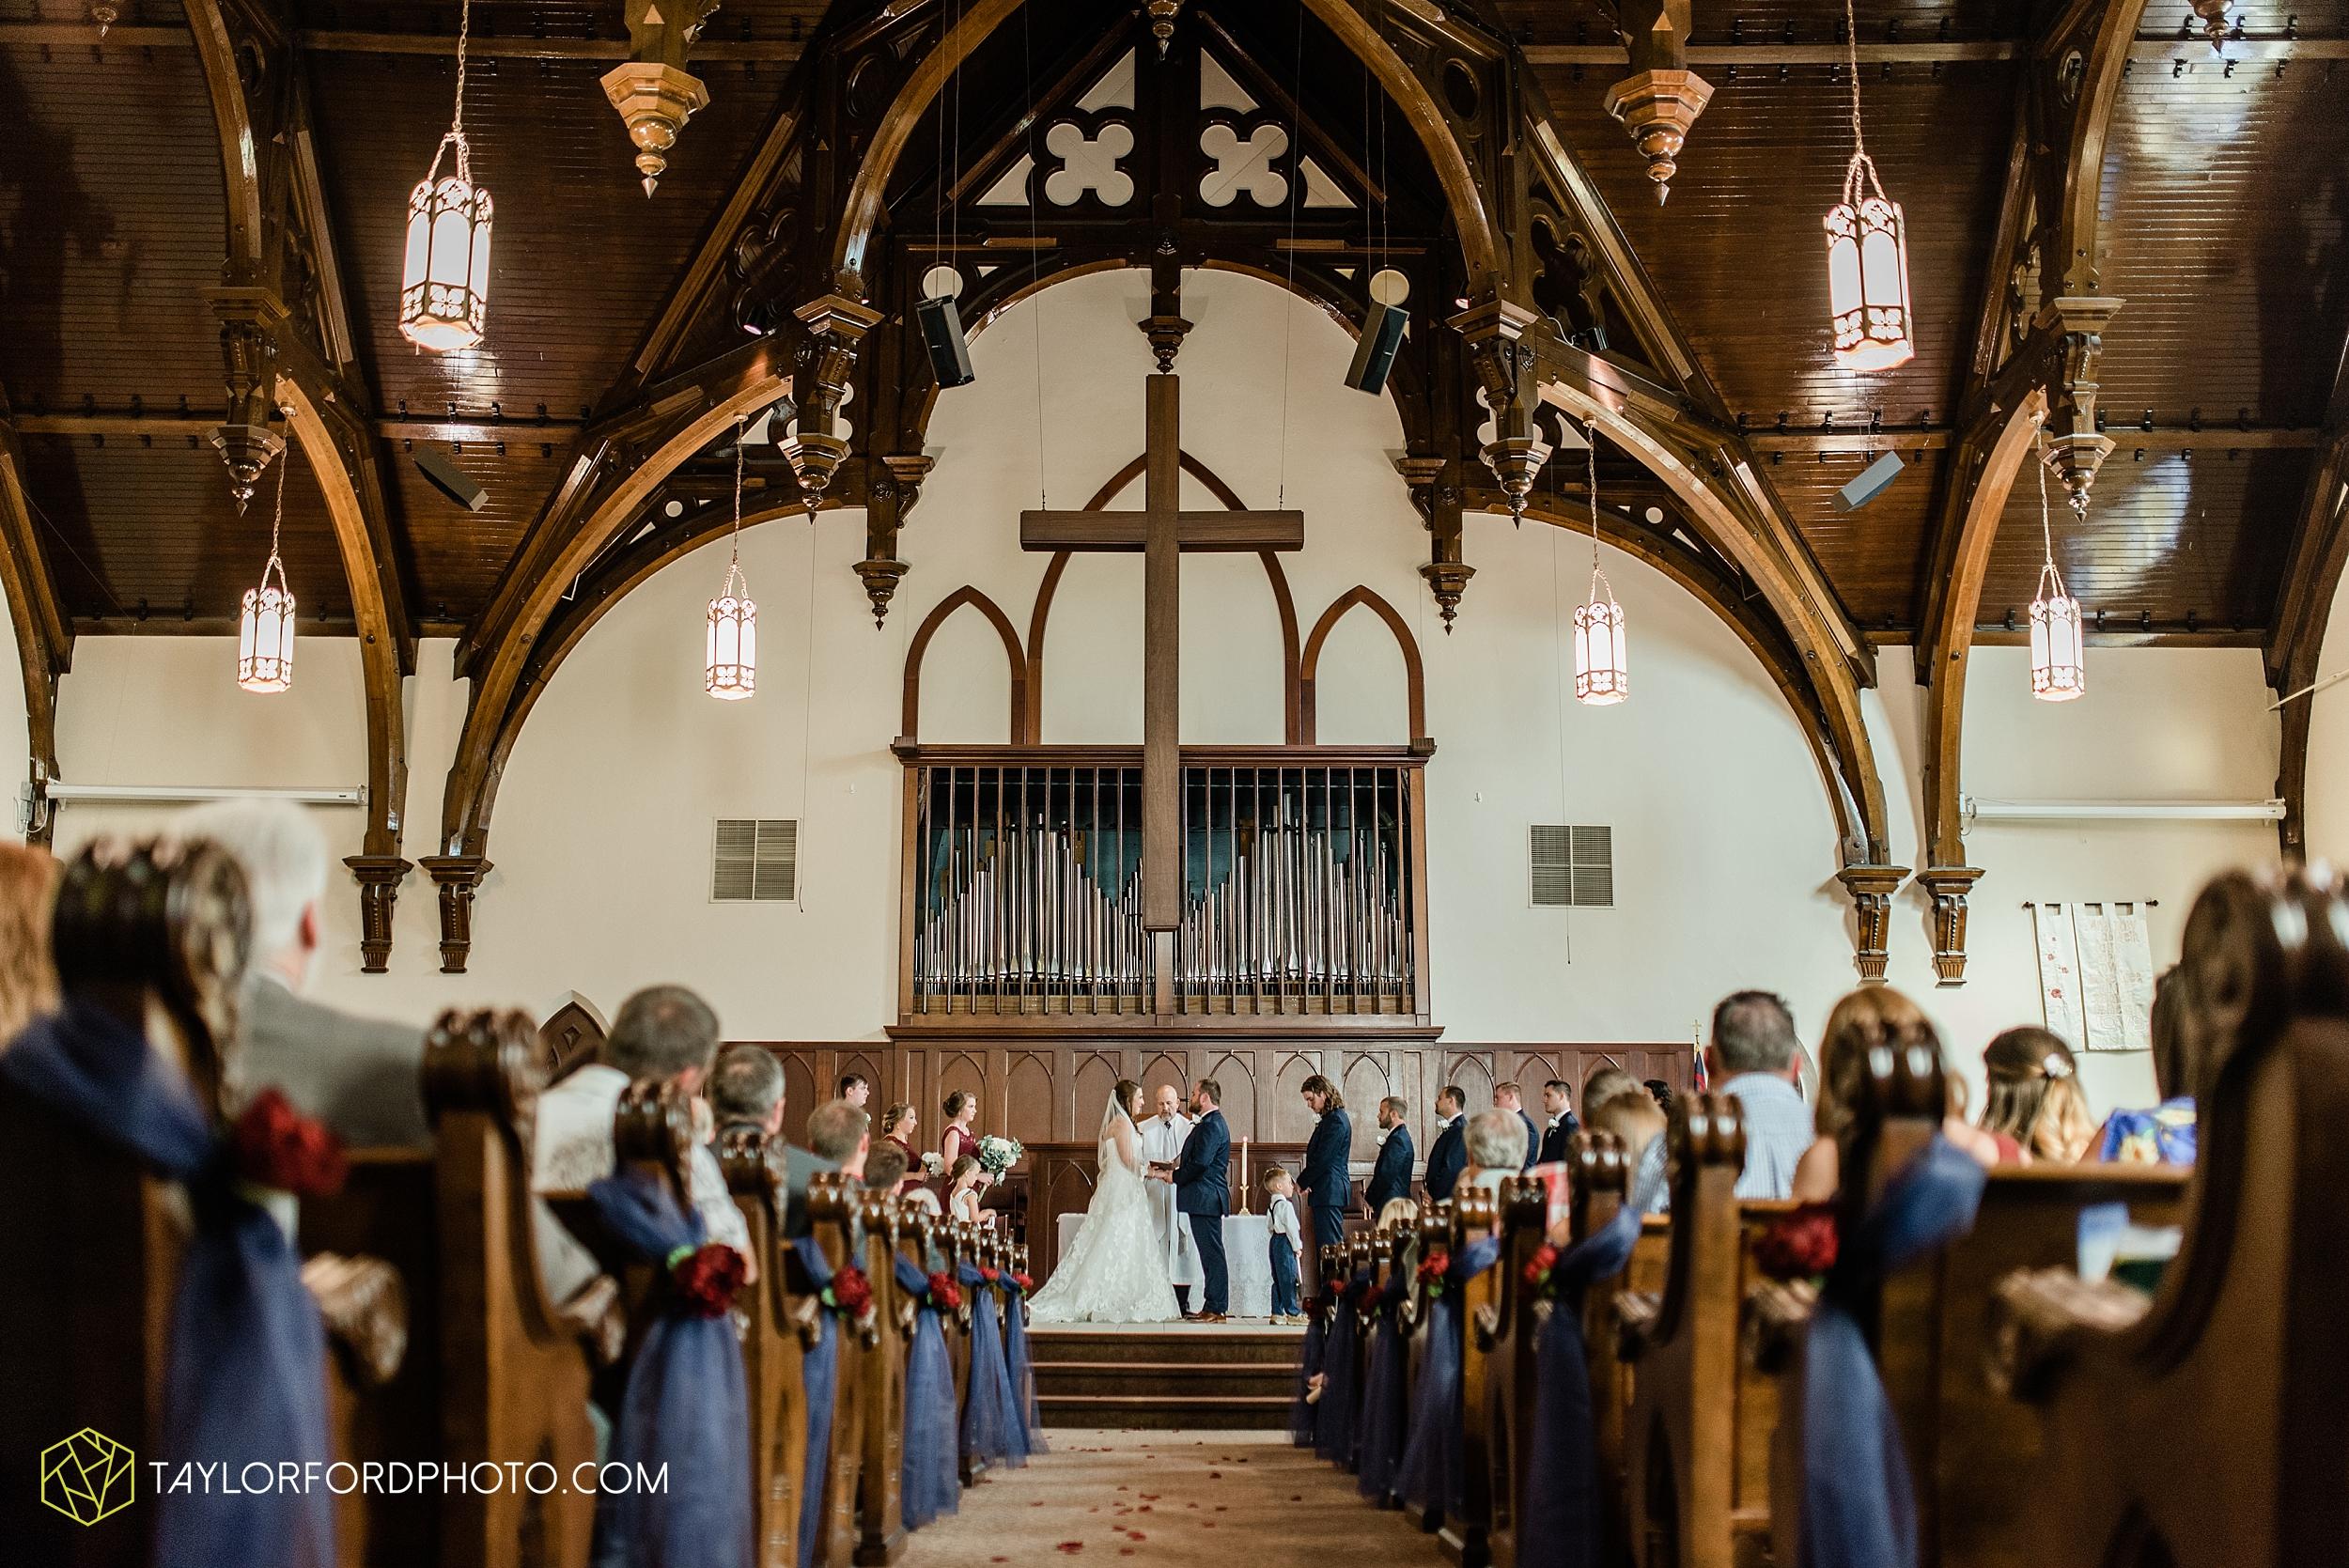 chelsey-zosh-jackson-young-first-united-methodist-church-senior-center-van-wert-ohio-wedding-photographer-taylor-ford-photography_0072.jpg